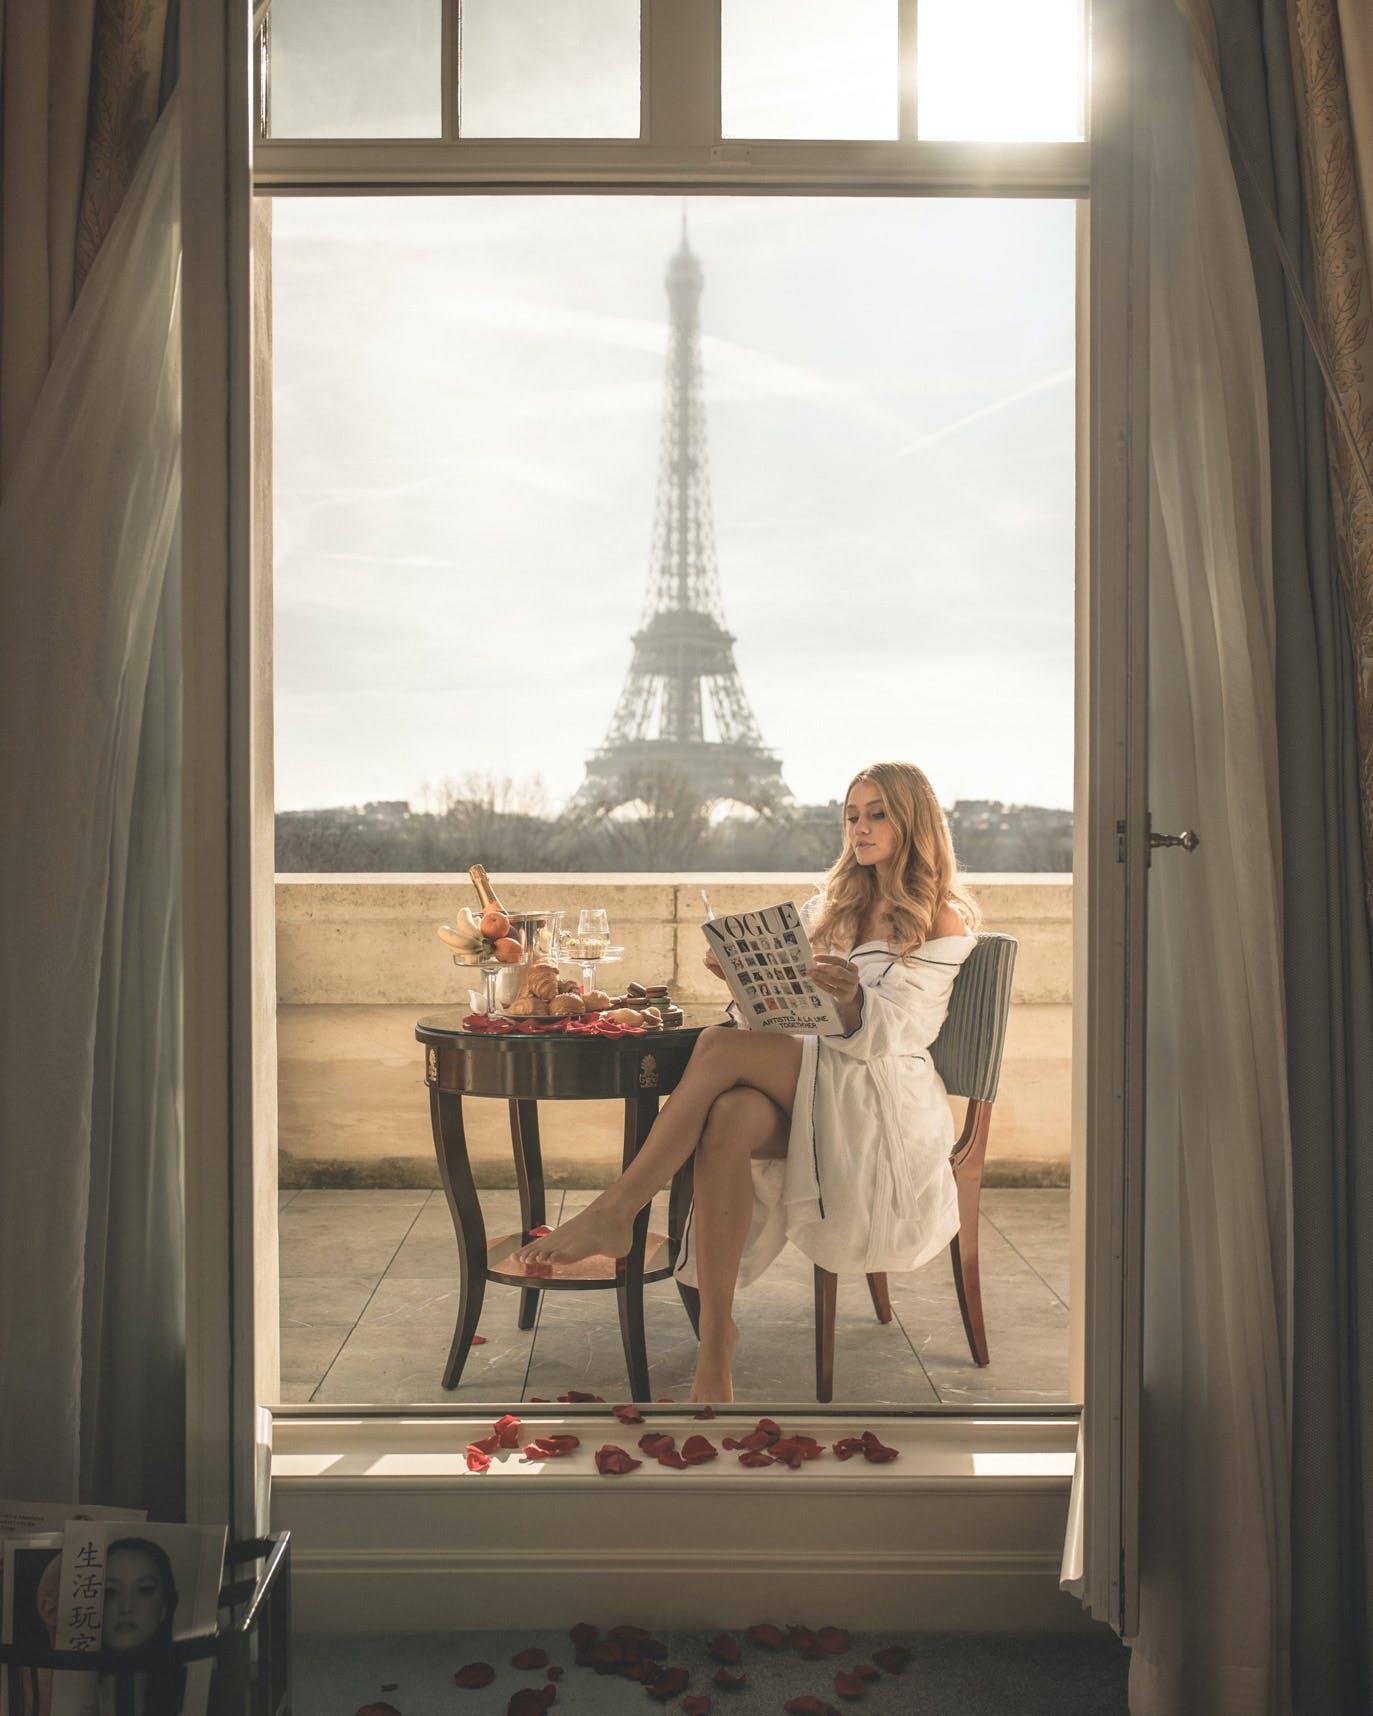 Shangri-La Hotel Eiffel Tower Bedroom view of Eiffel Tower